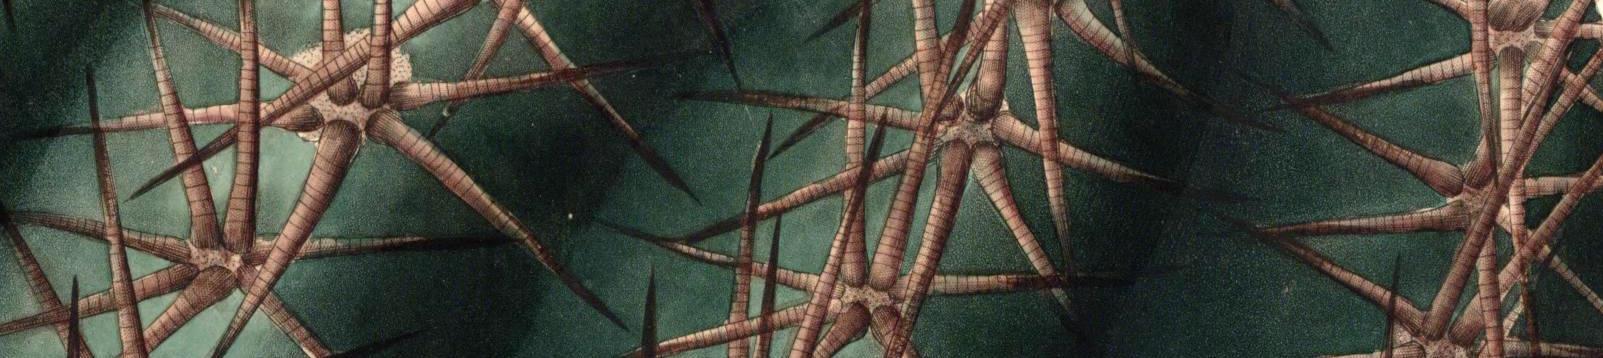 cactus-banner.jpg